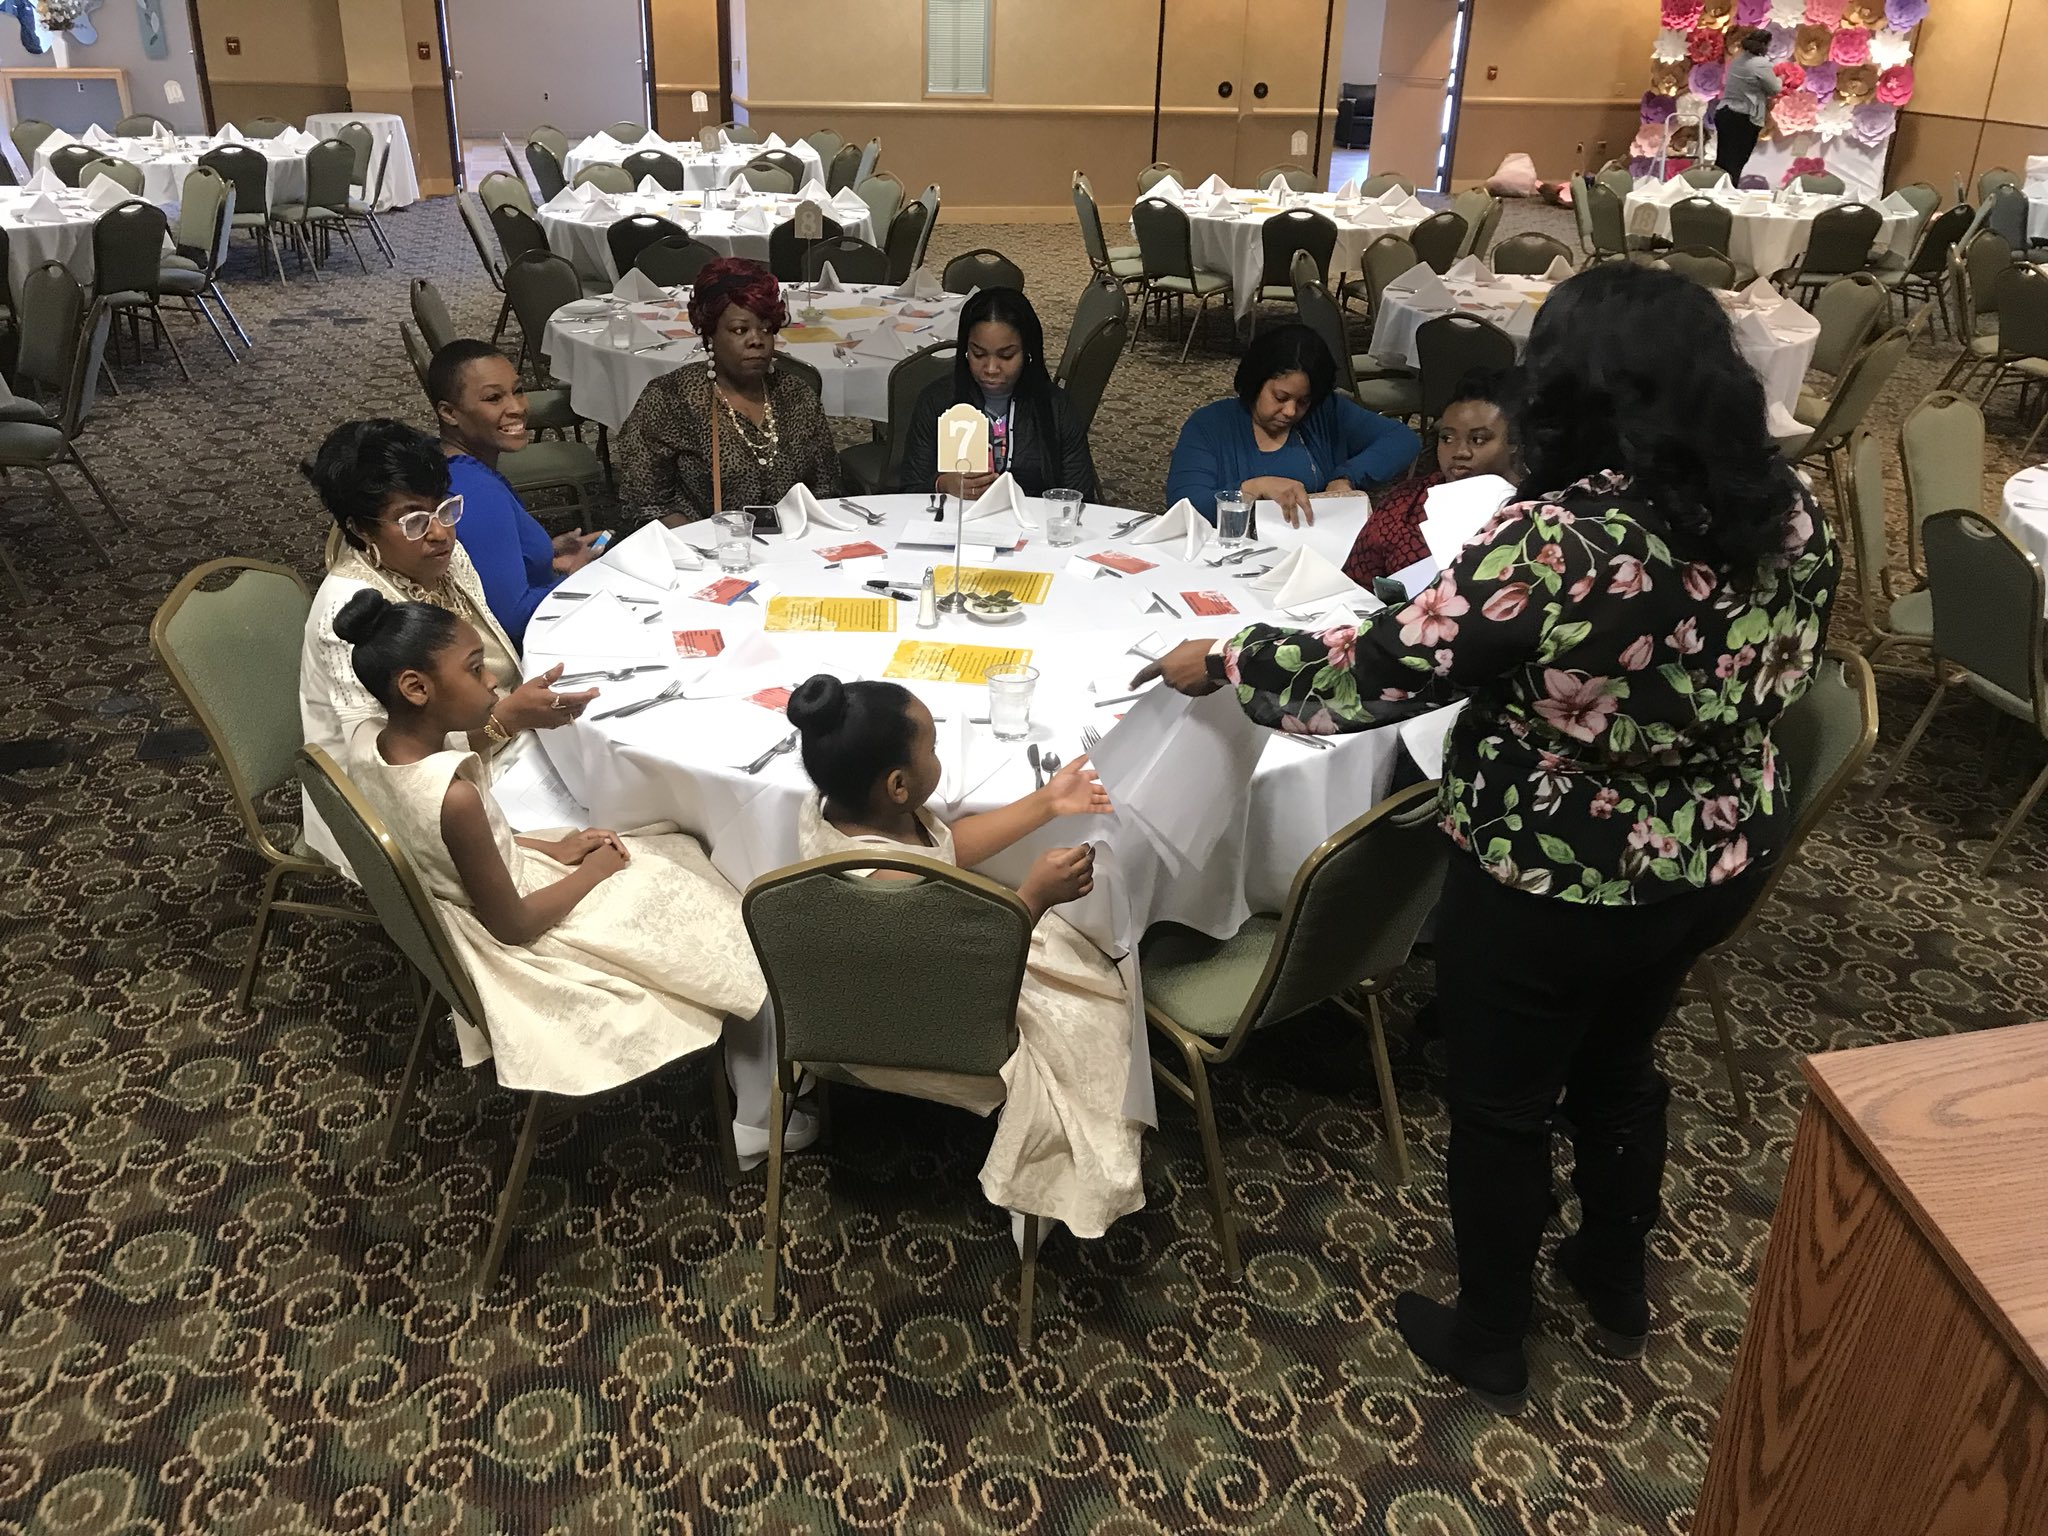 Our host committee here in Flint preparing to welcome Black women here for the #BlackWomensBrunch https://t.co/Iwv5yJ4N9n